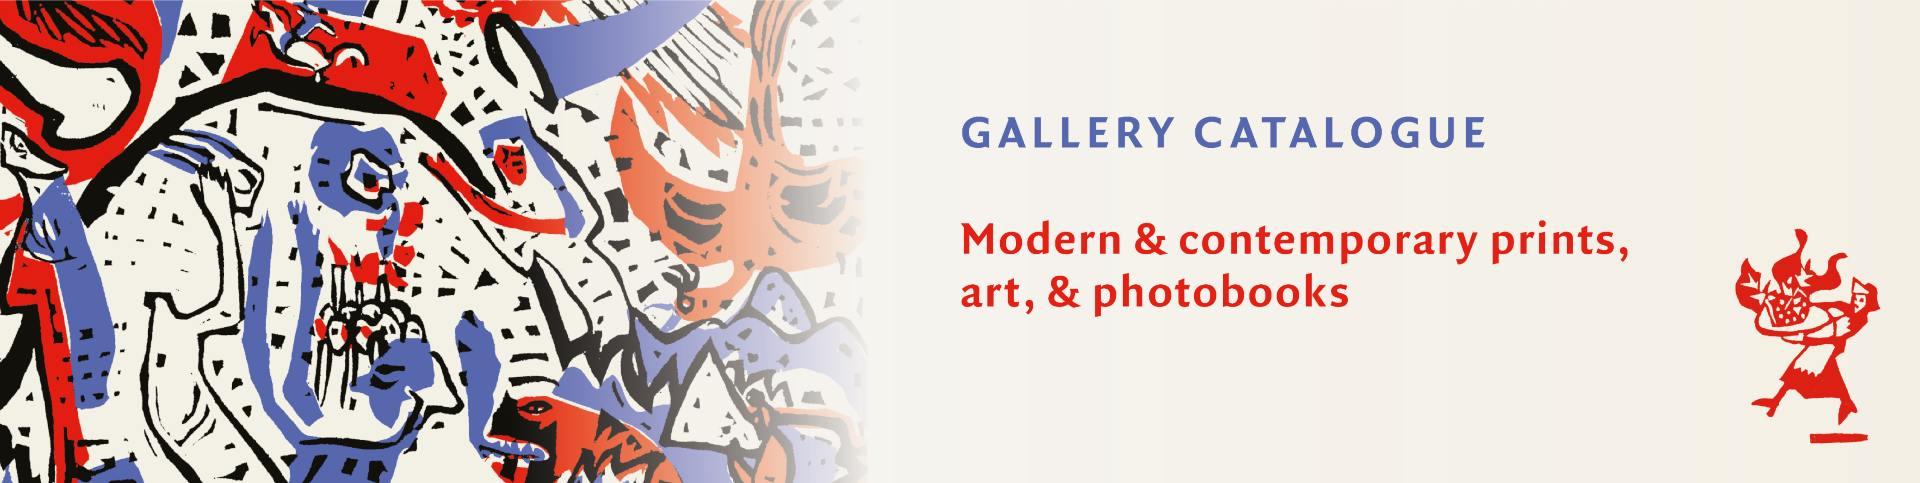 Peter Harrington Gallery 2020